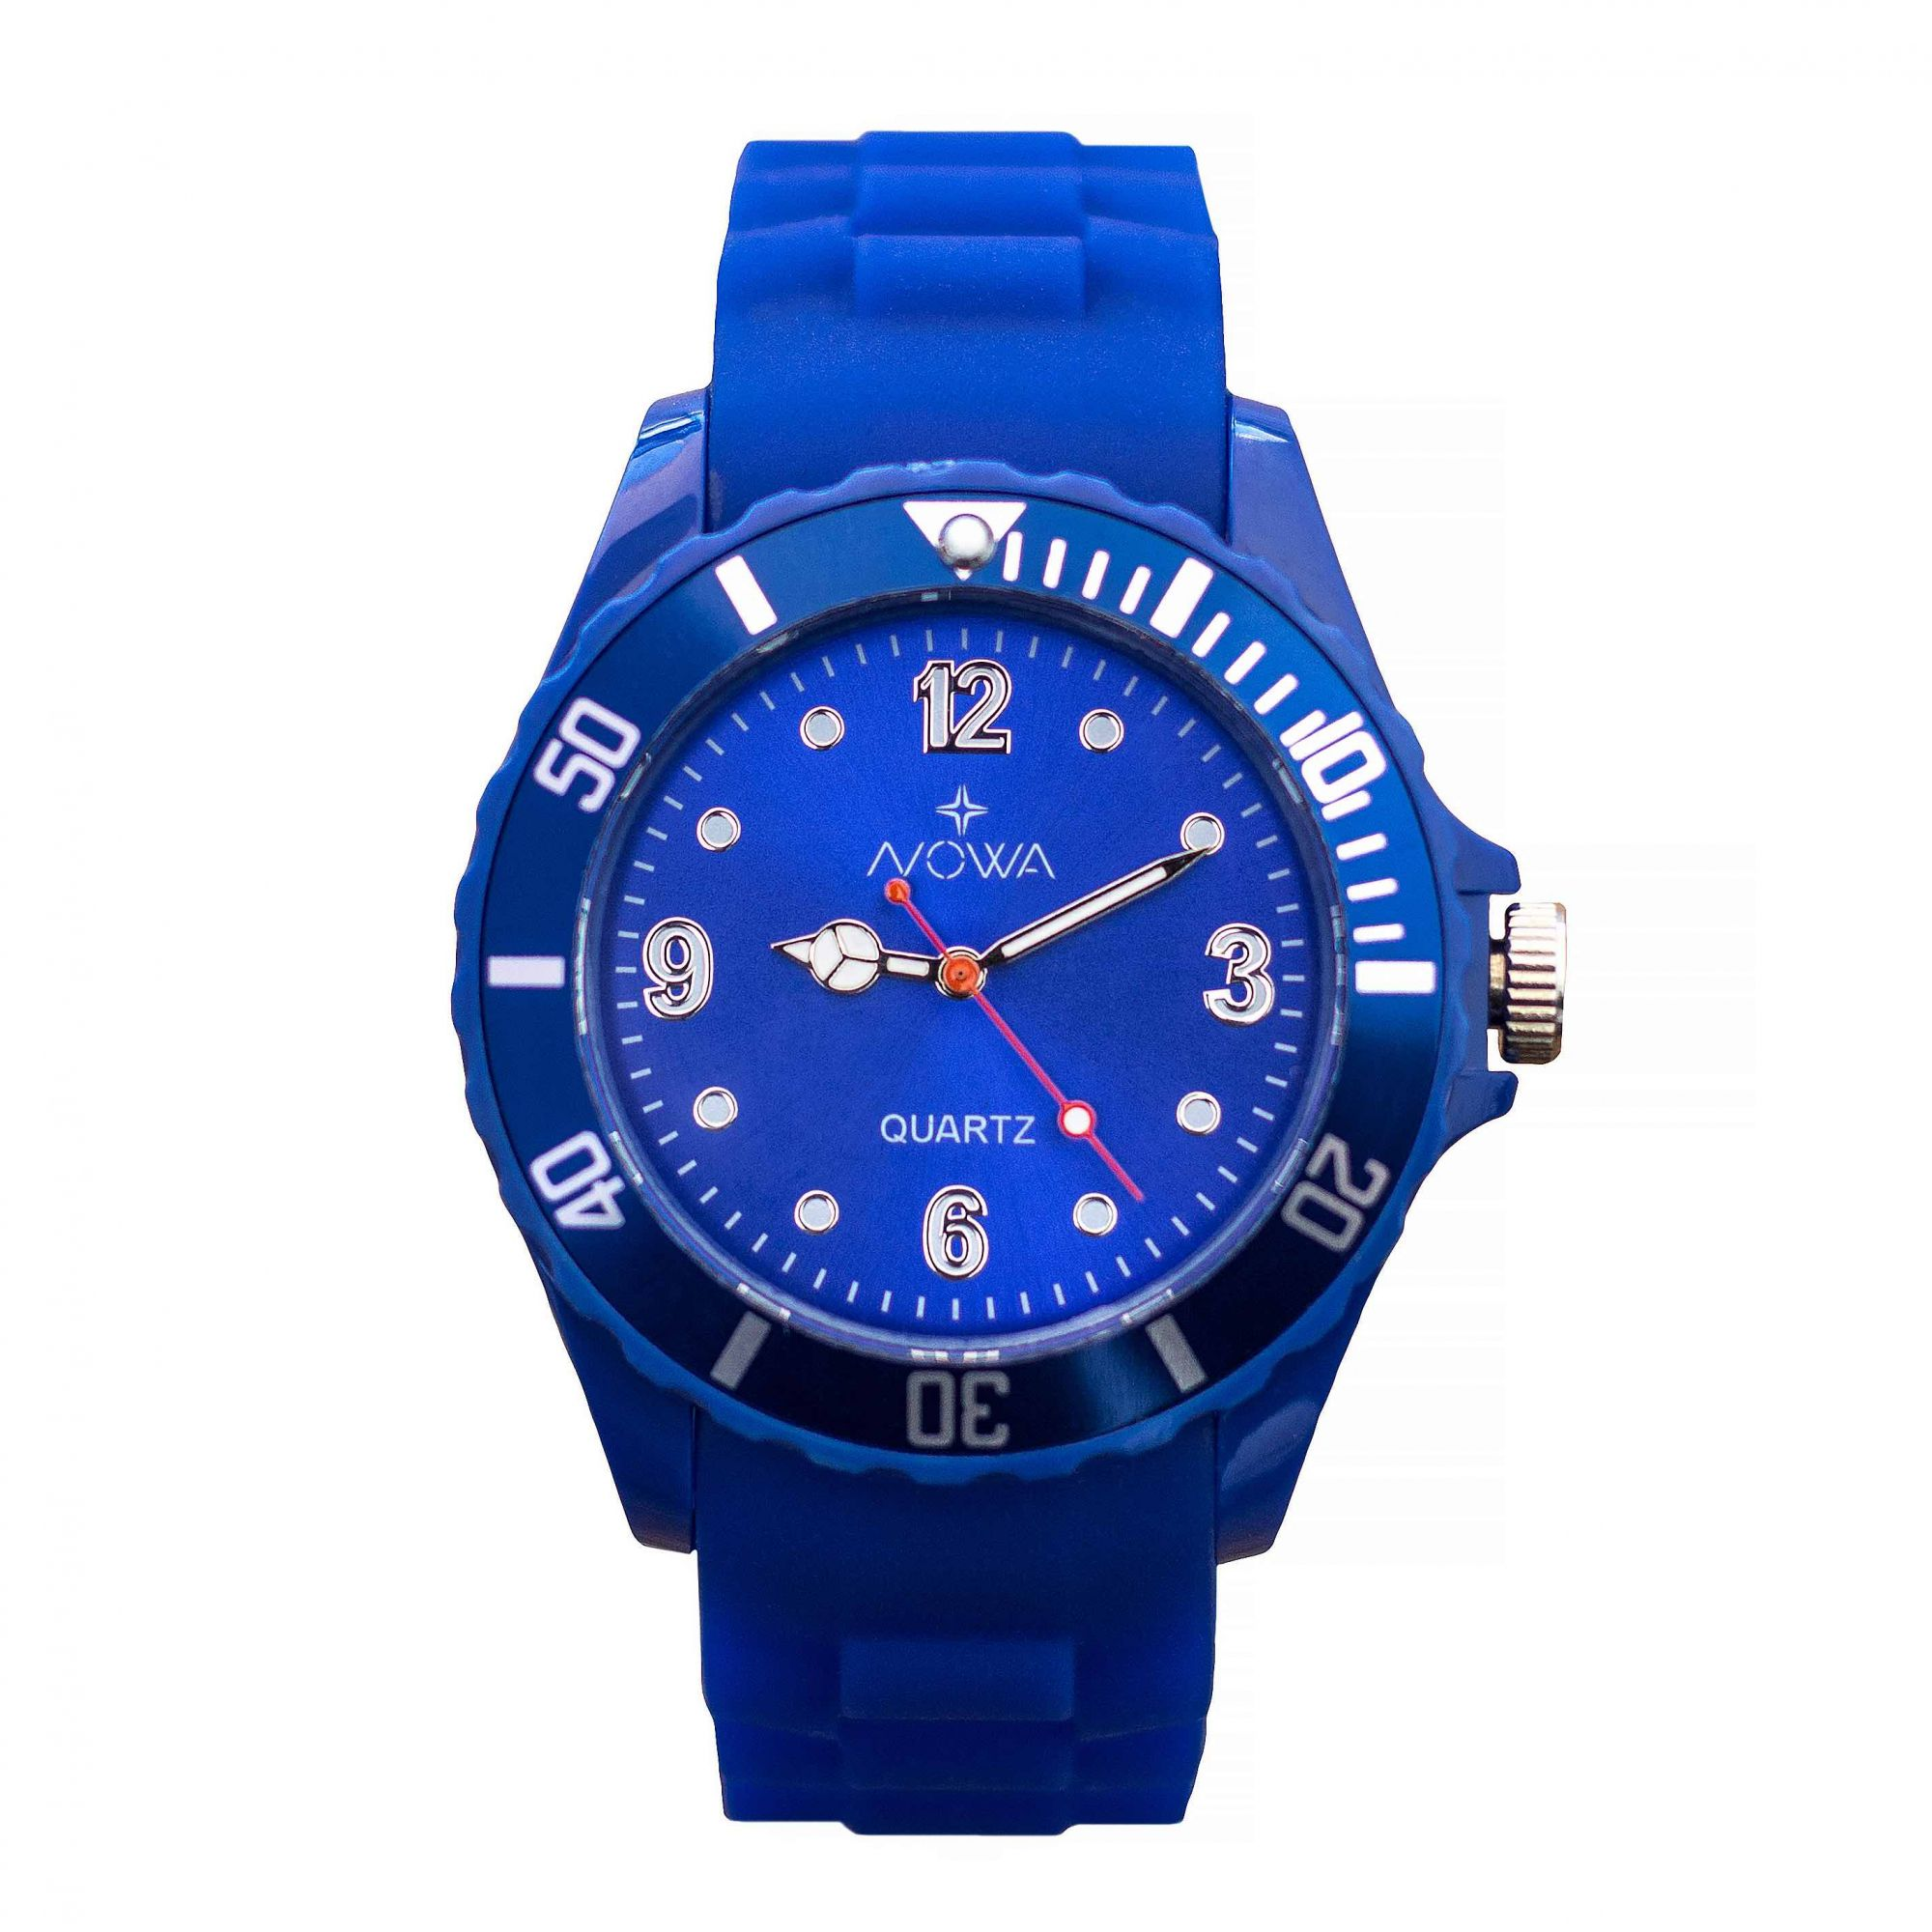 Relógio Nowa Masculino Azul NW0522AK Borracha